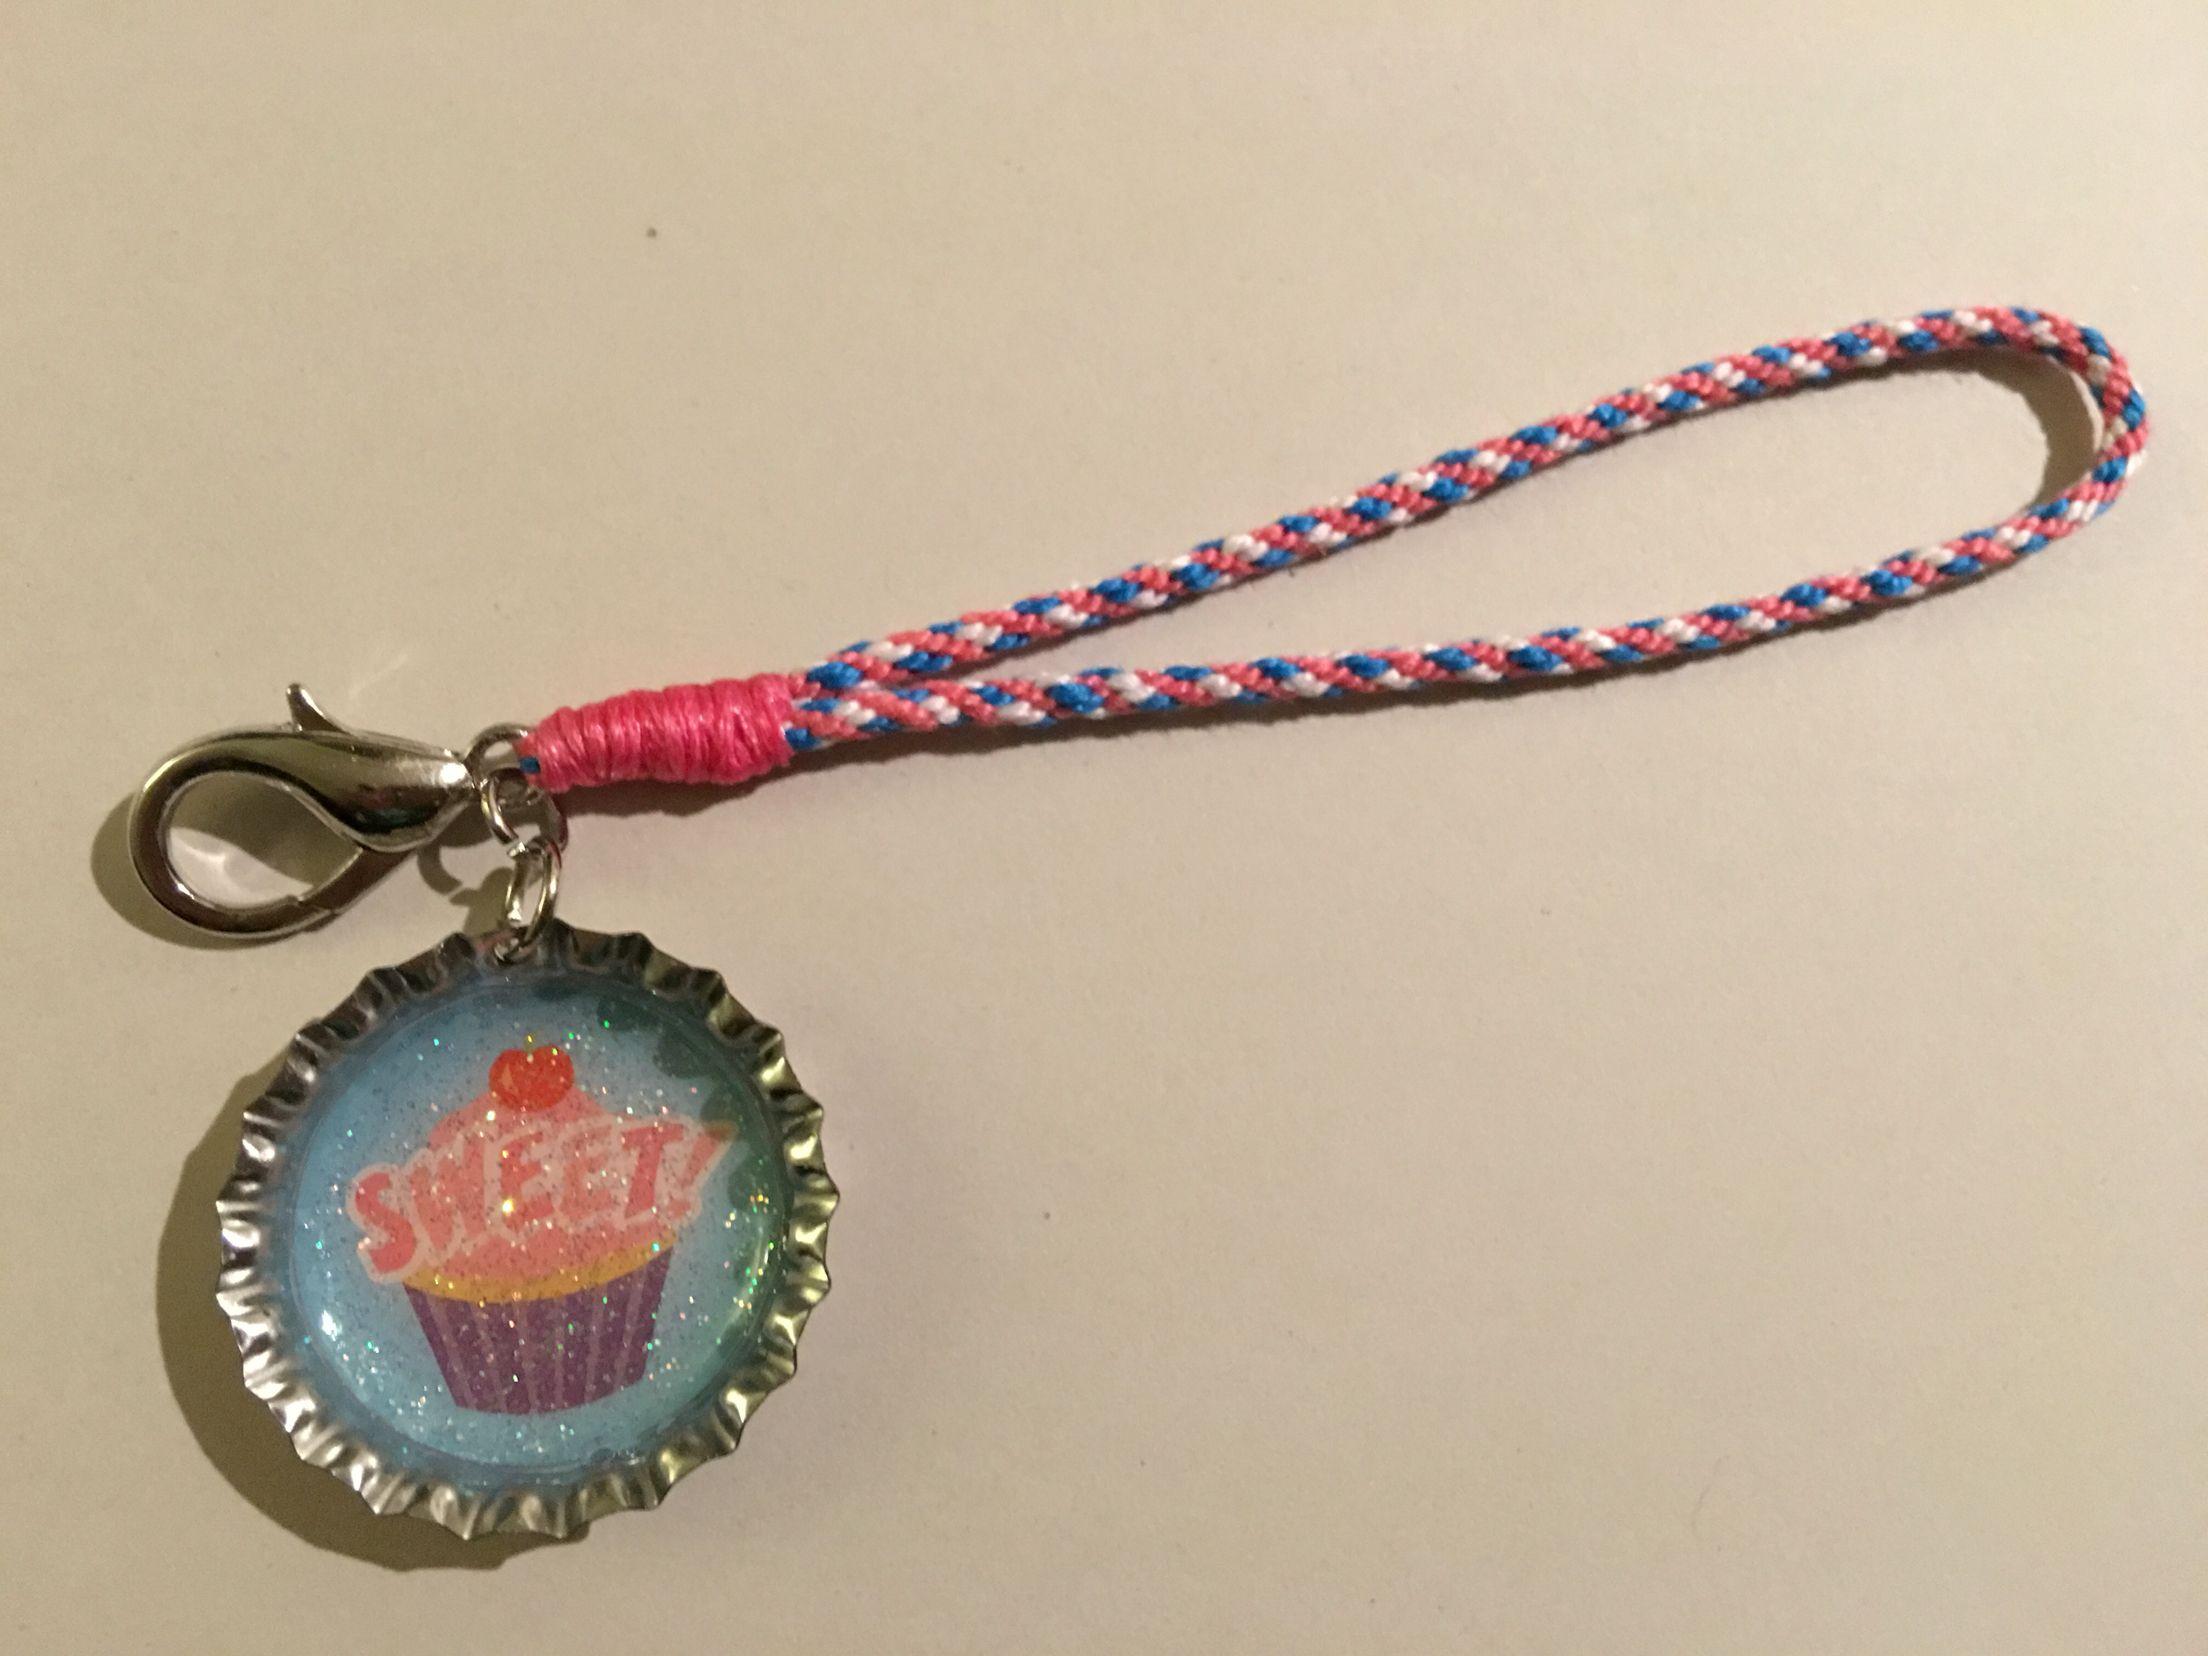 Handmade kumihimo keychain made by Mario H Lopez